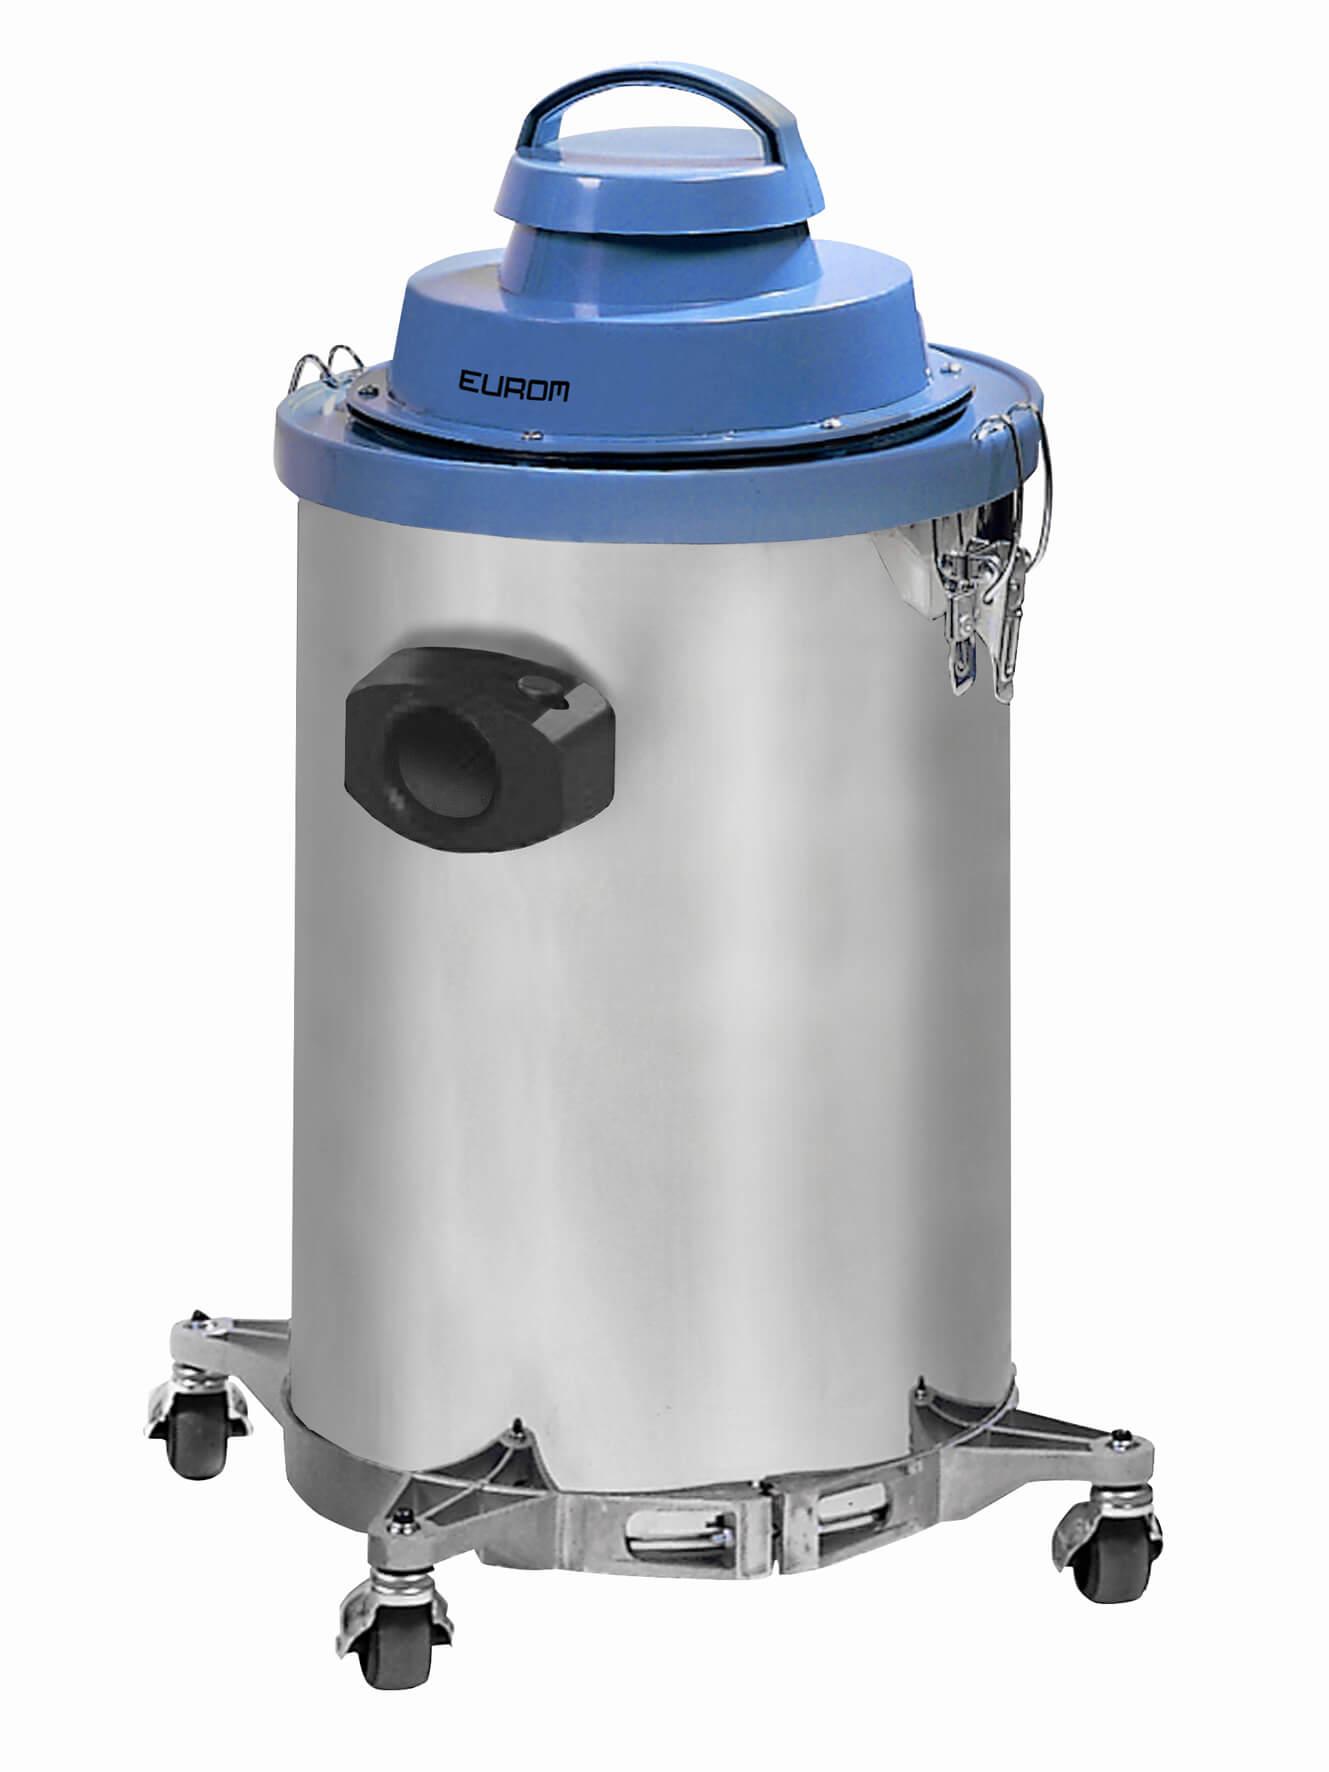 Eurom 1030RVS Industriële alleszuiger 1000W | Stofzuiger en waterzuiger 30ltr RVS-tank